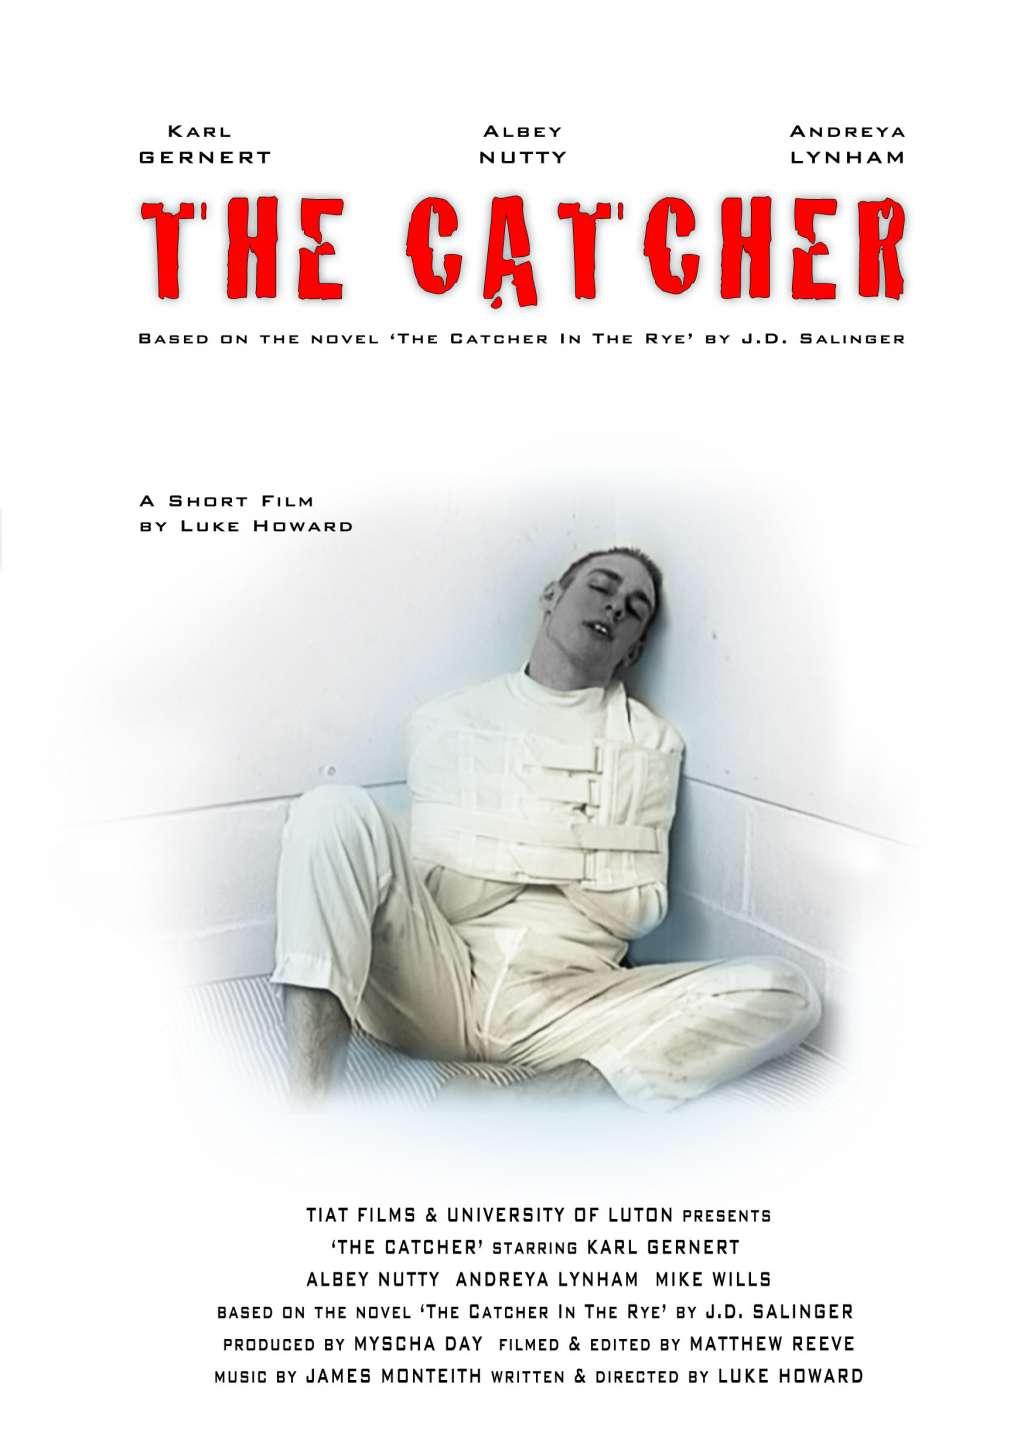 The Catcher kapak